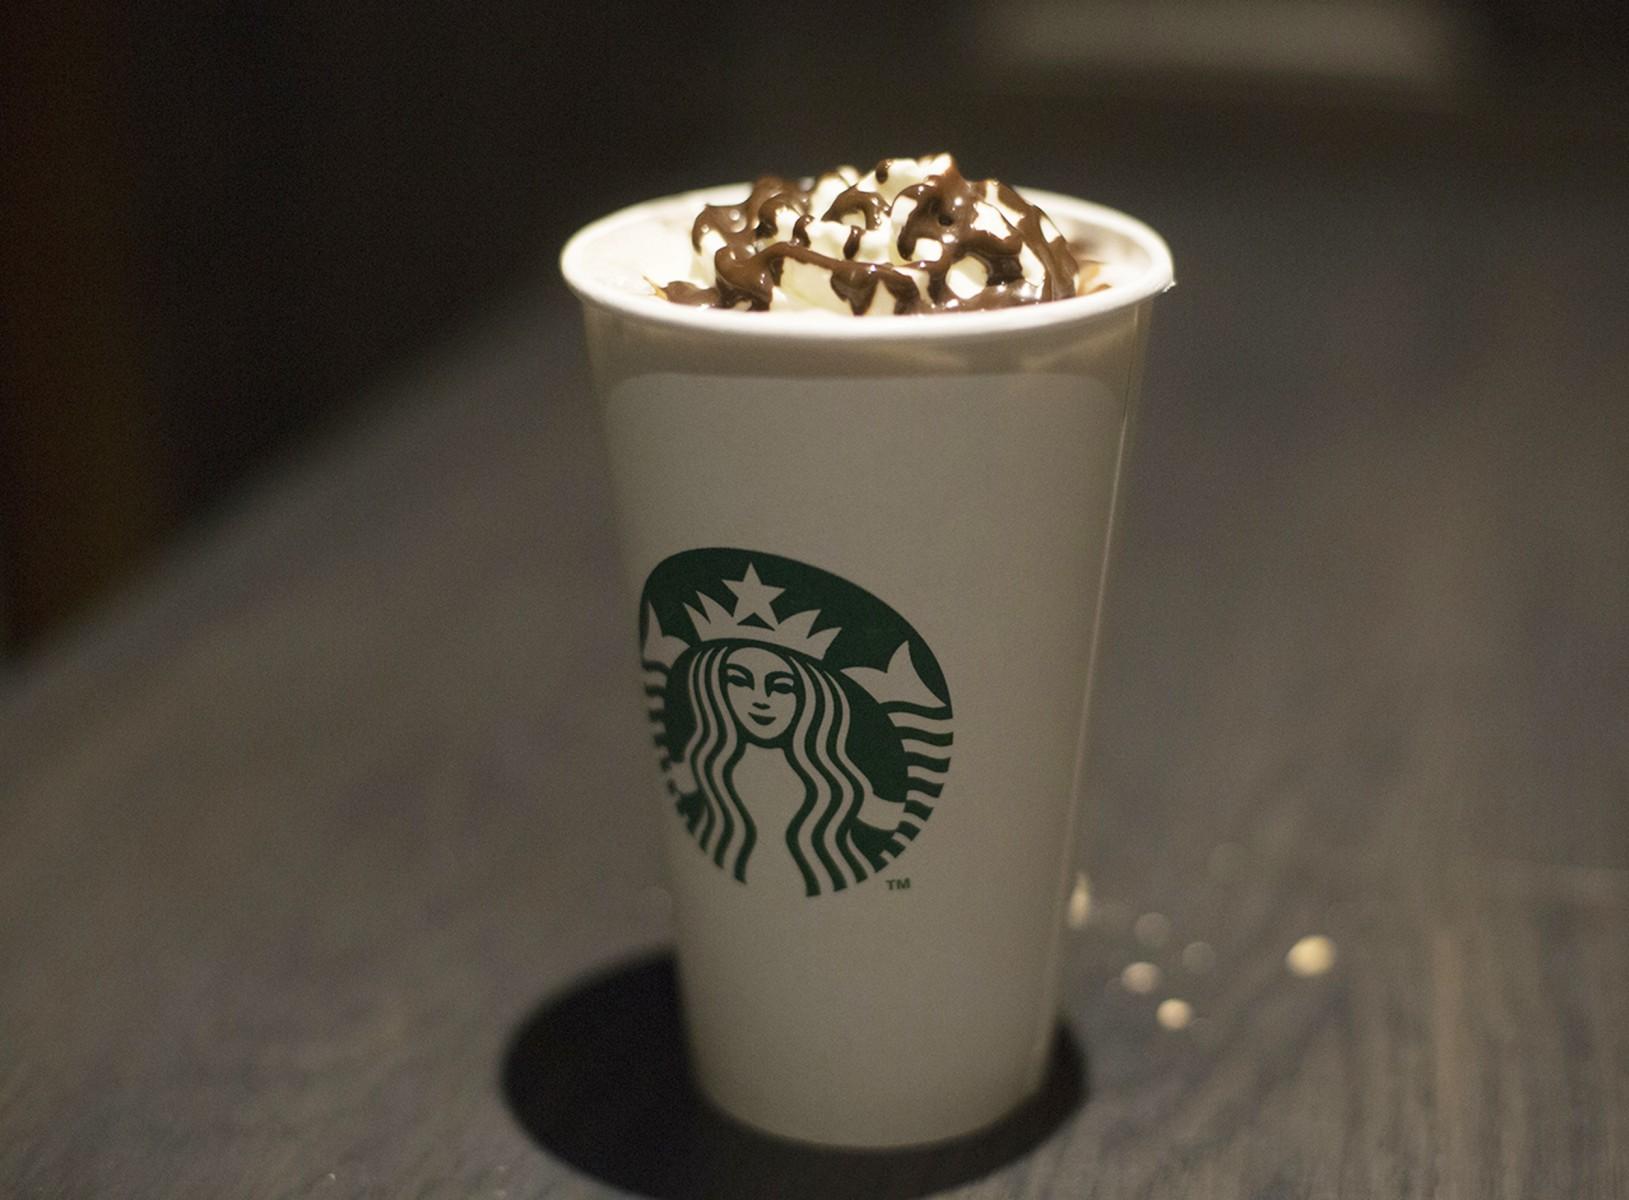 How To Make Coffee Taste Like Starbucks White Chocolate Mocha